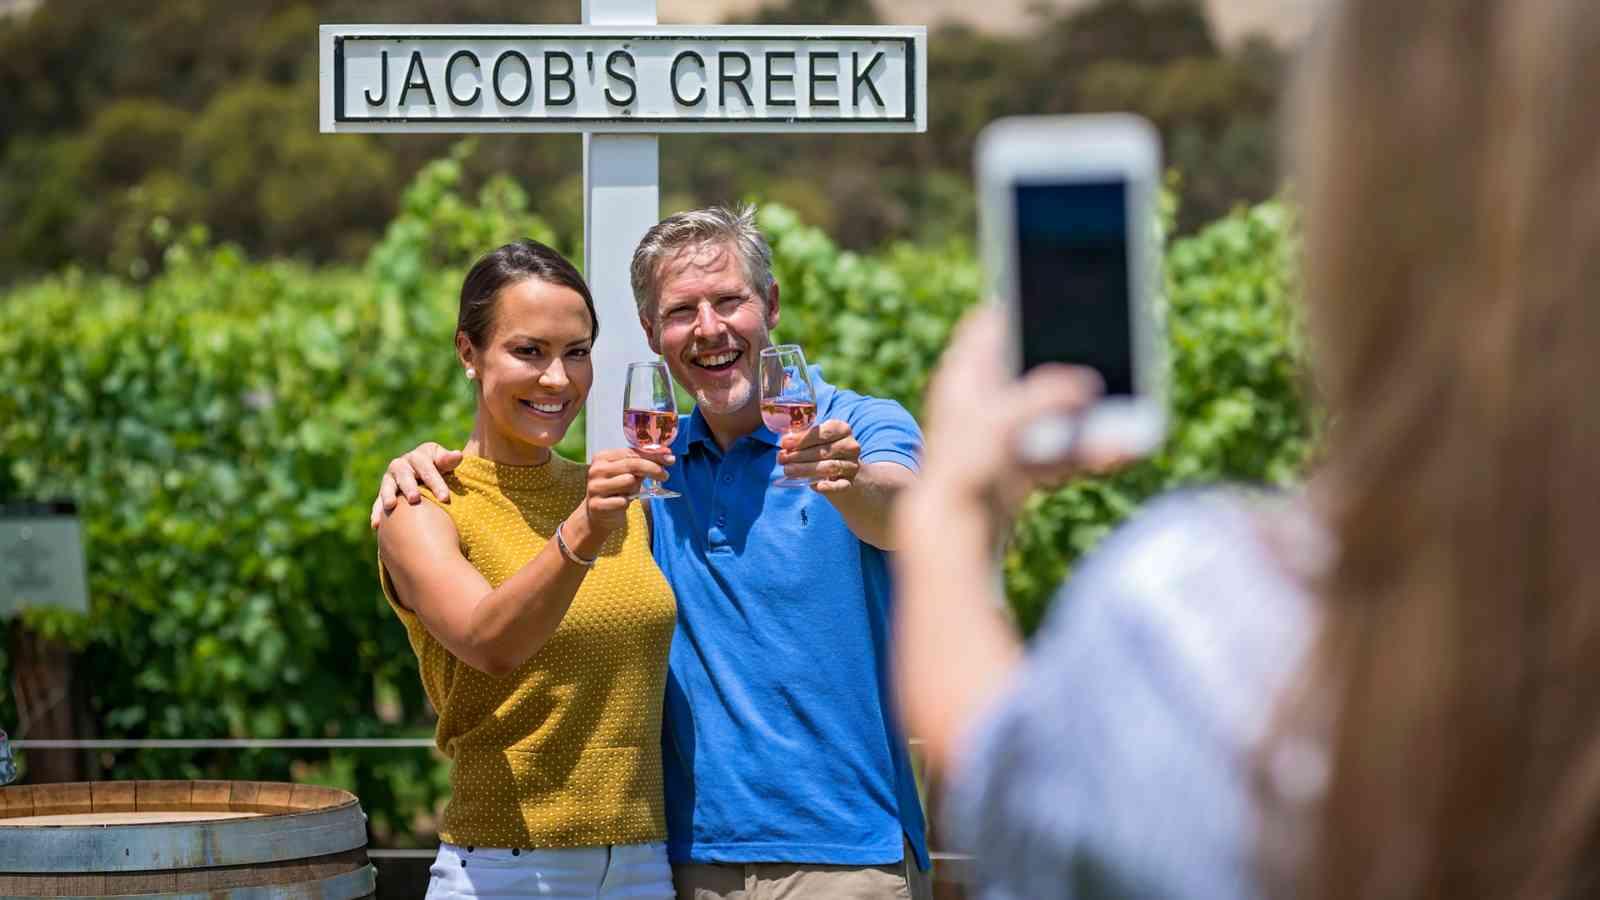 Barossa Jacobs Creek